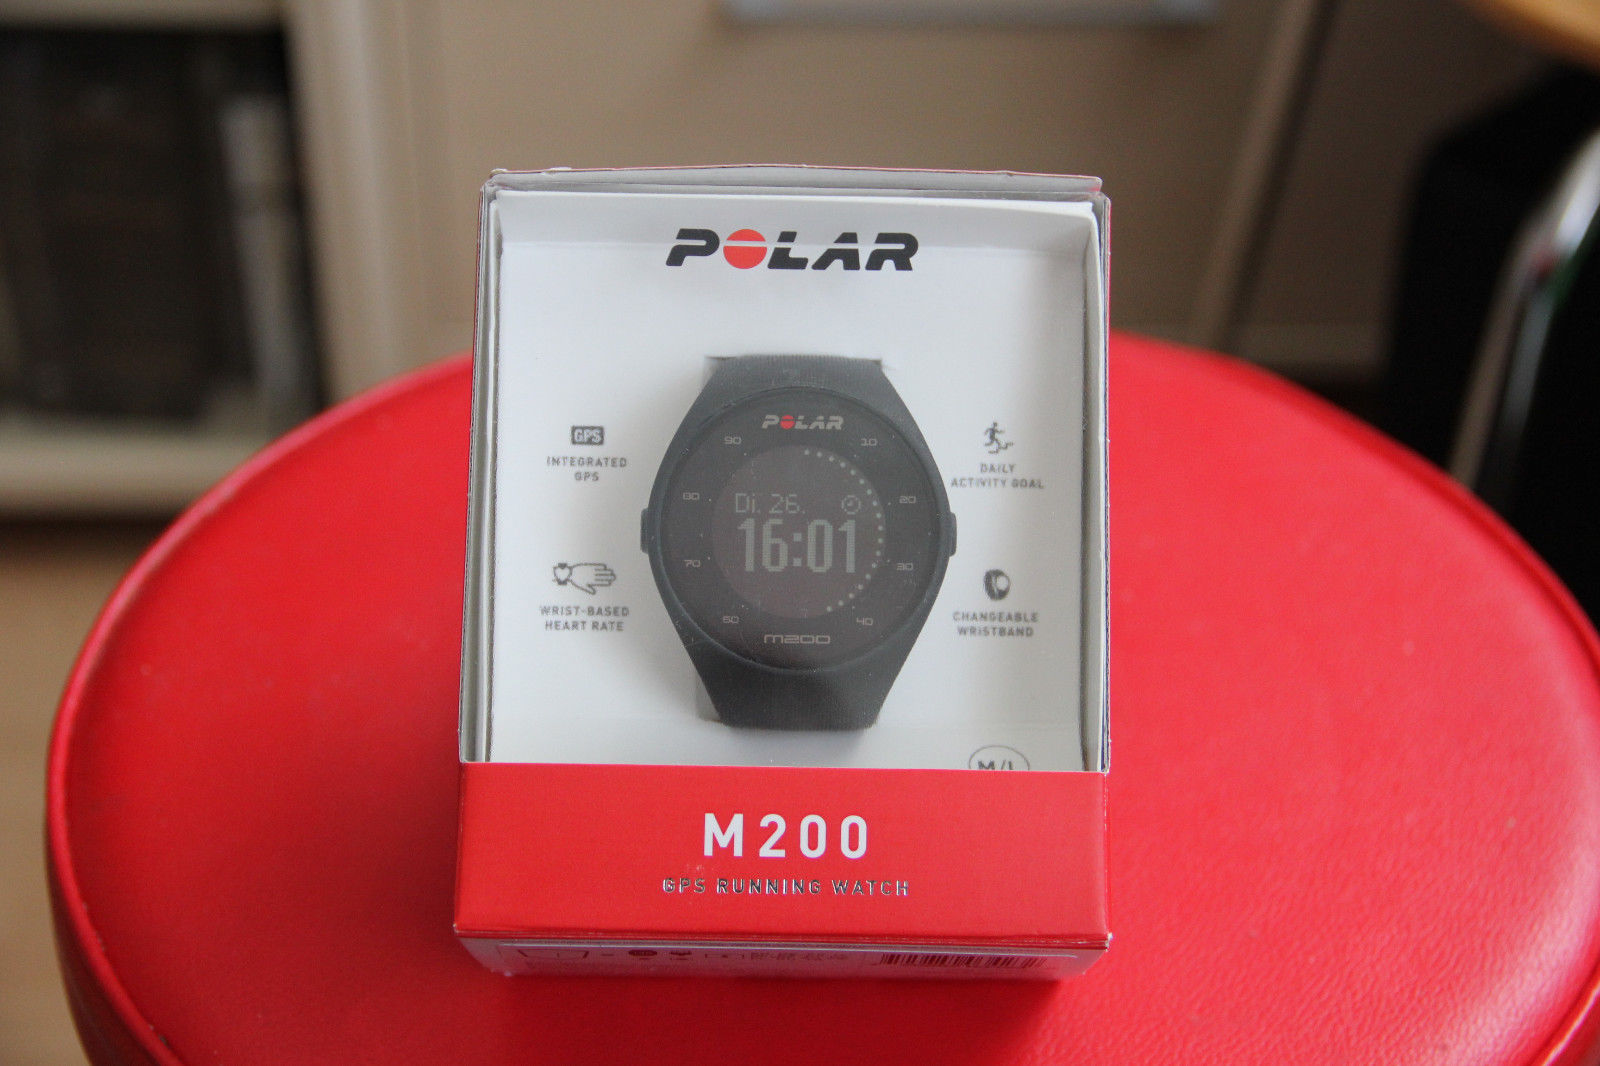 Polar M200 multifunktionale GPS-Pulsuhr ohne Brustgurt